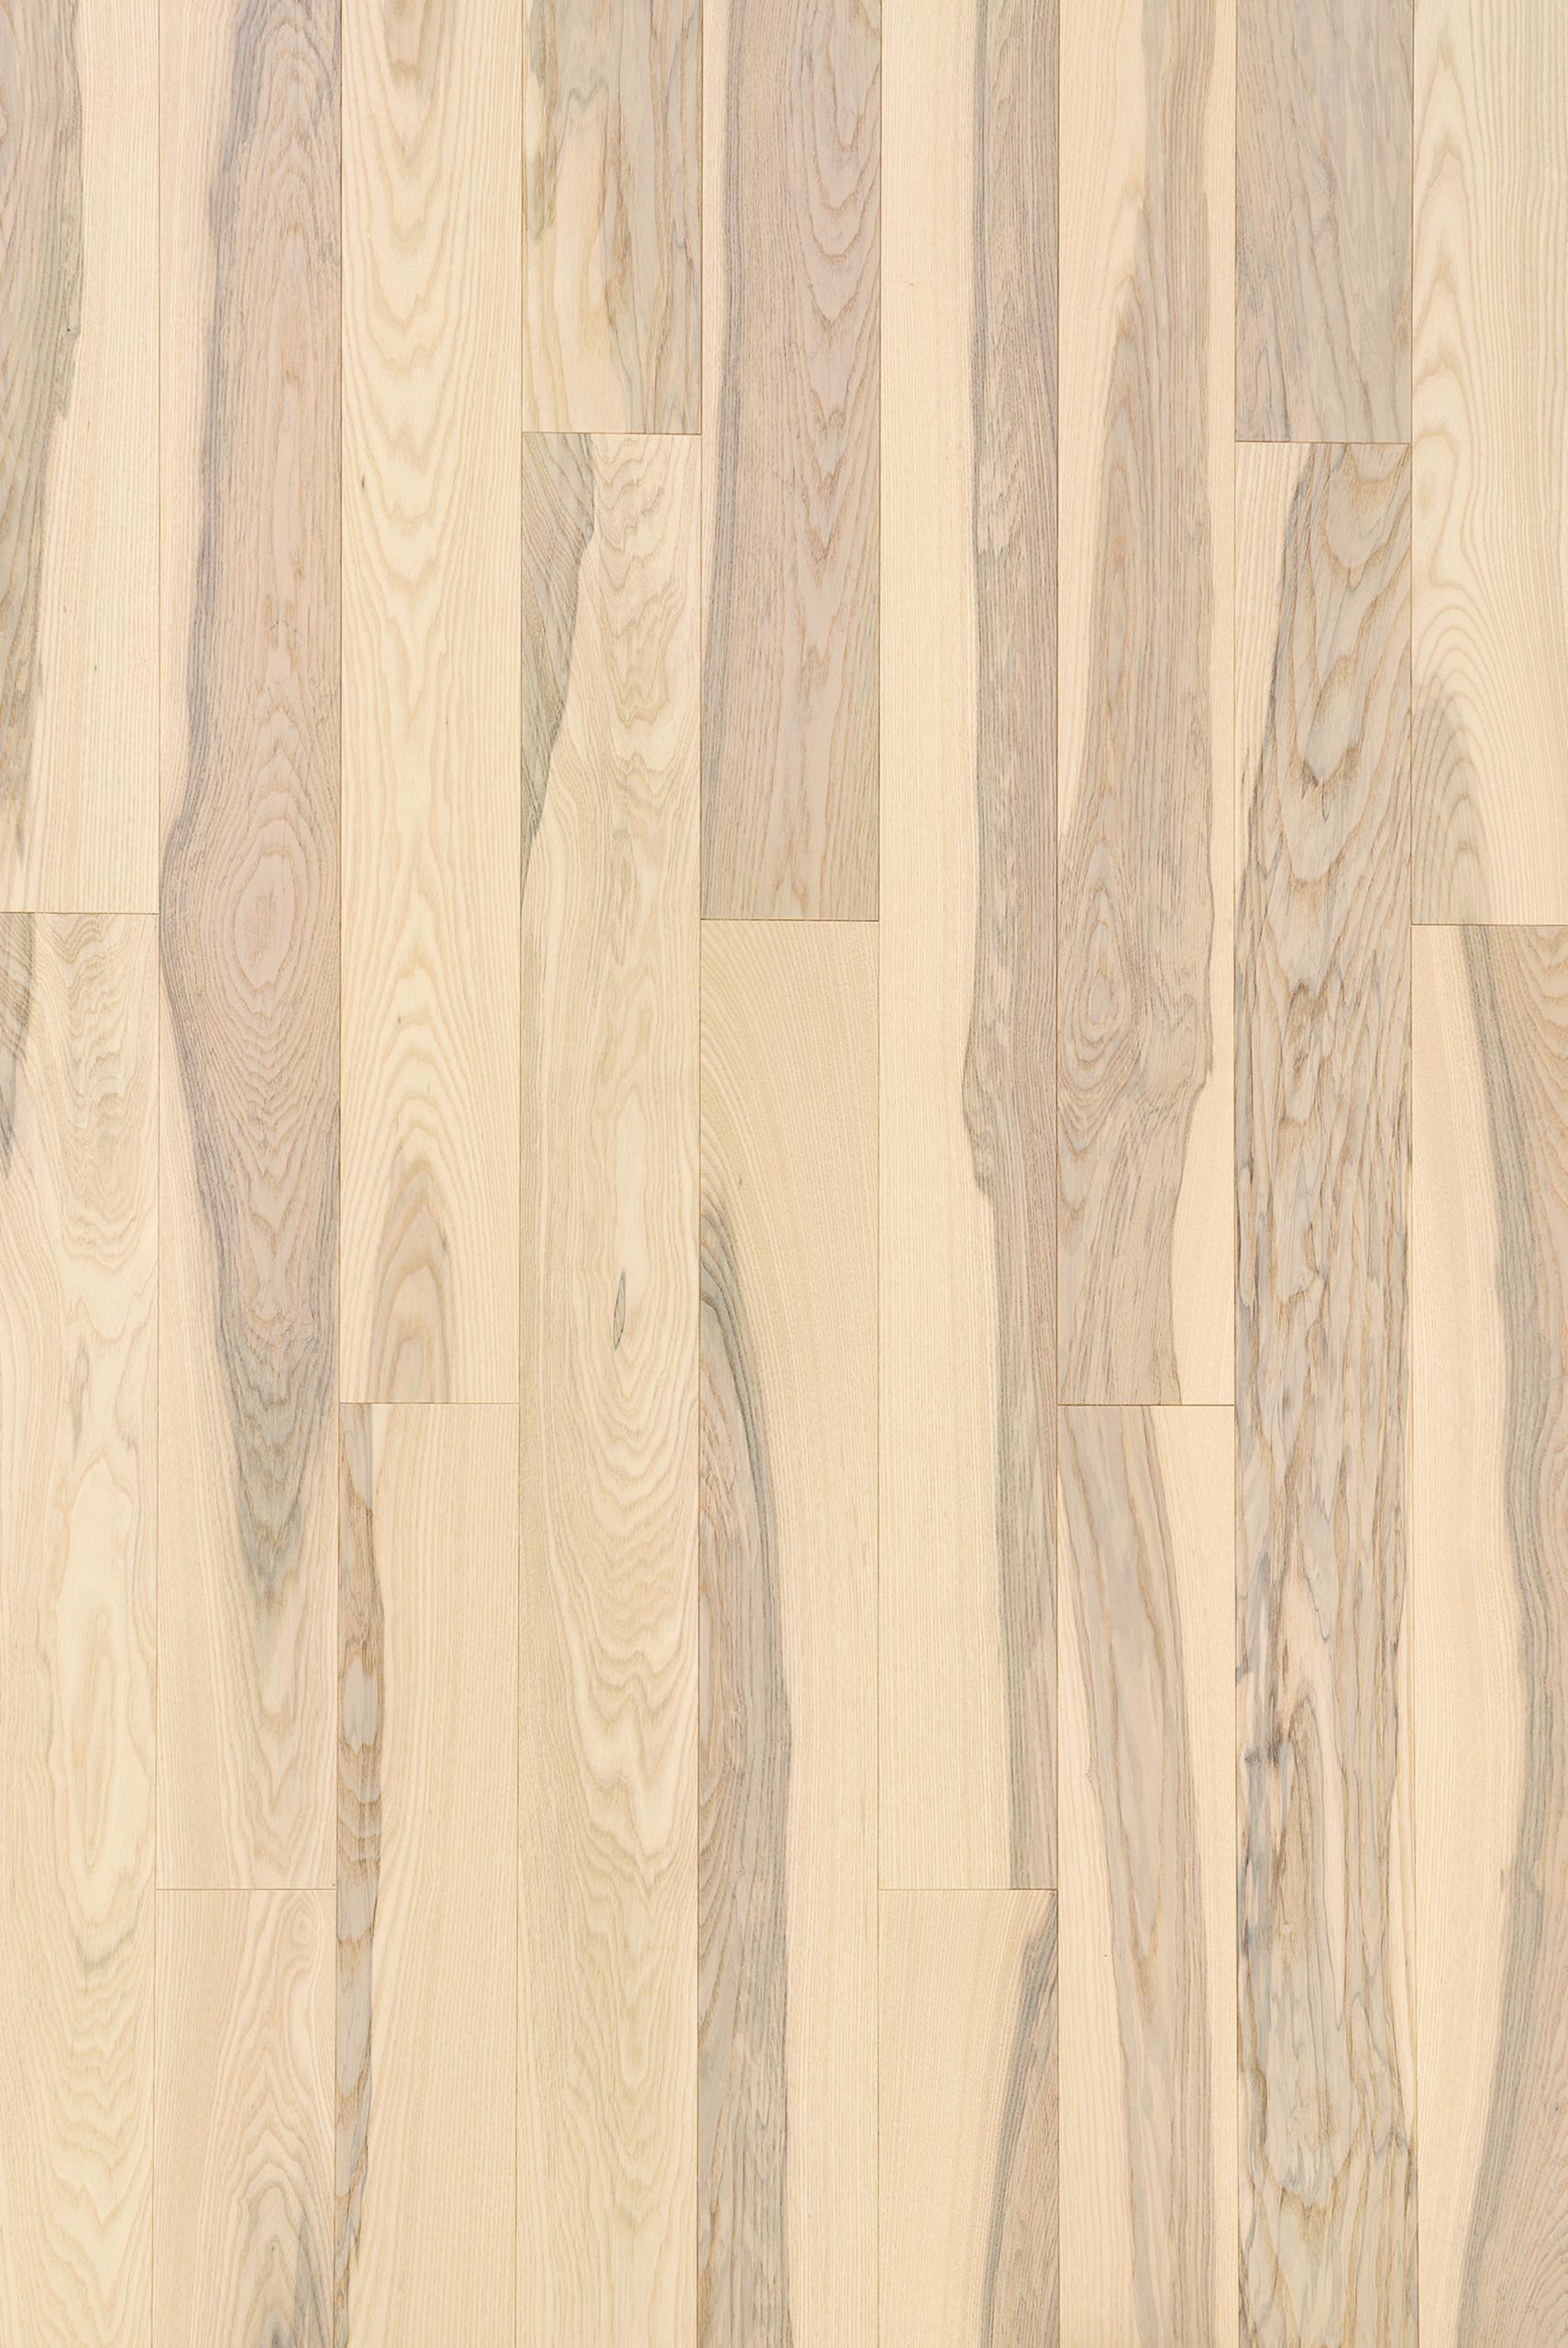 Timberwise-parketti-puulattia-wooden-floor-parquet-Saarni-Ash-White-Wax-Oil